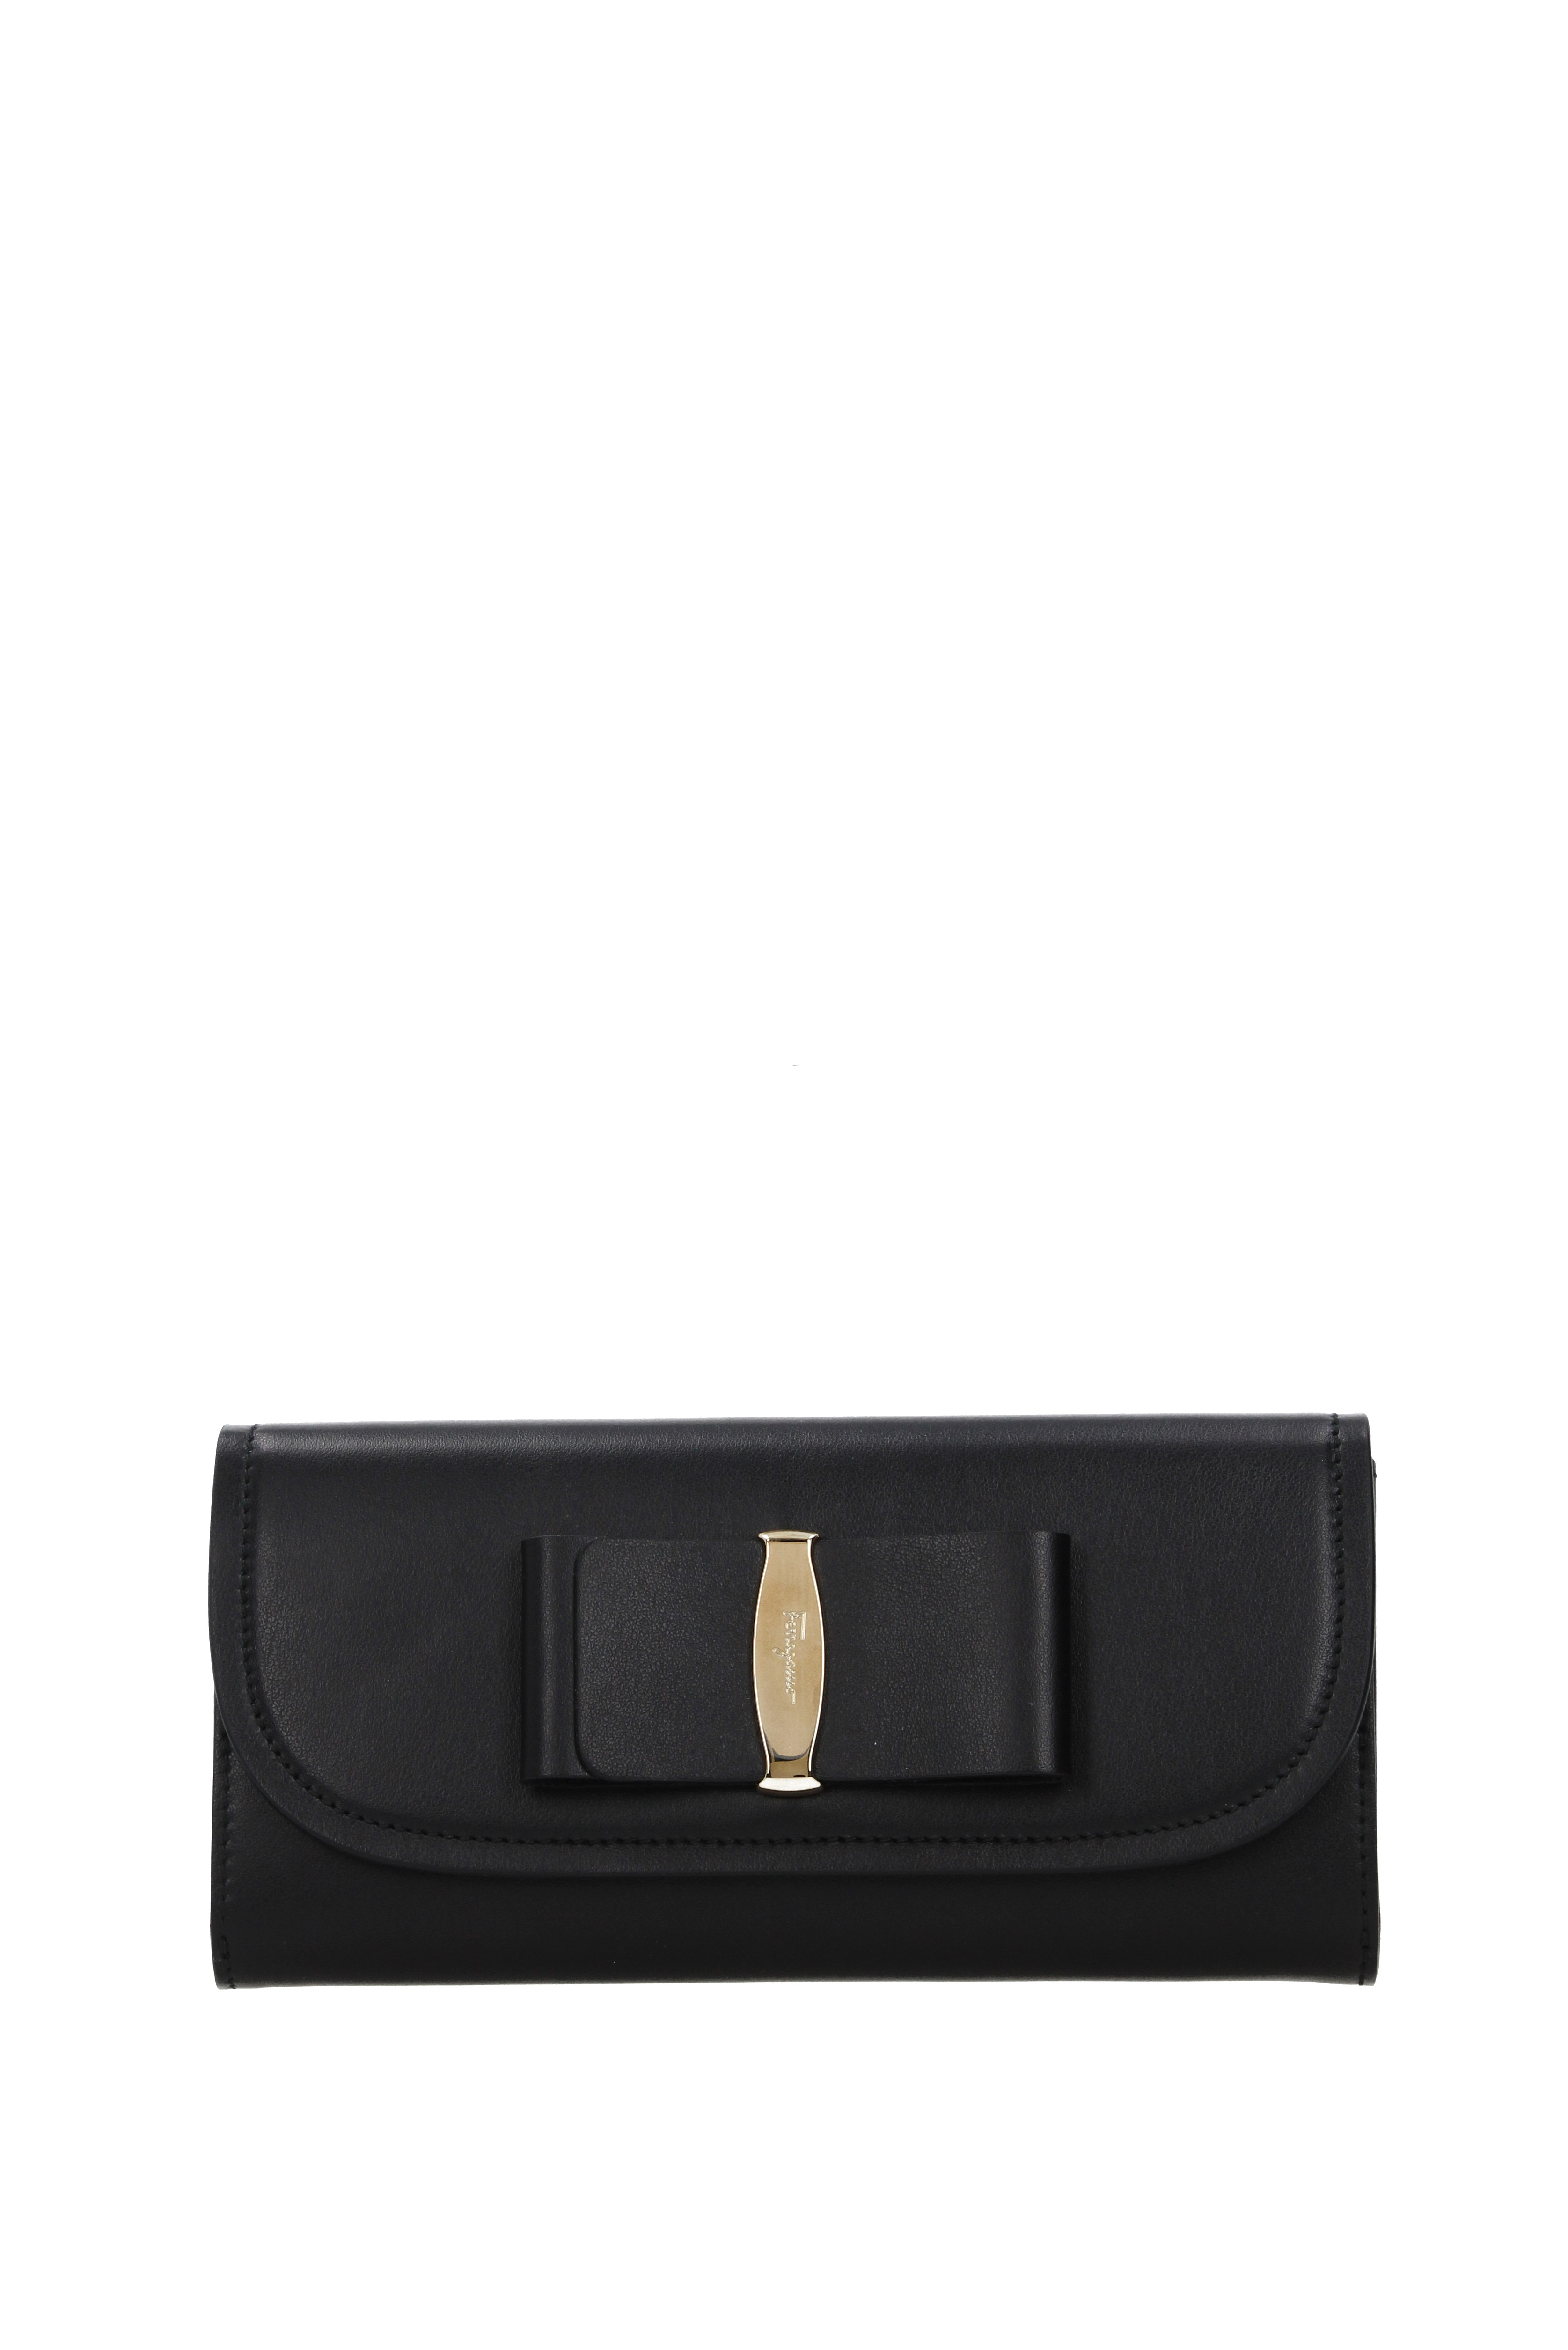 Brieftasche-Salvatore-Ferragamo-Damen-Leder-22C69006604